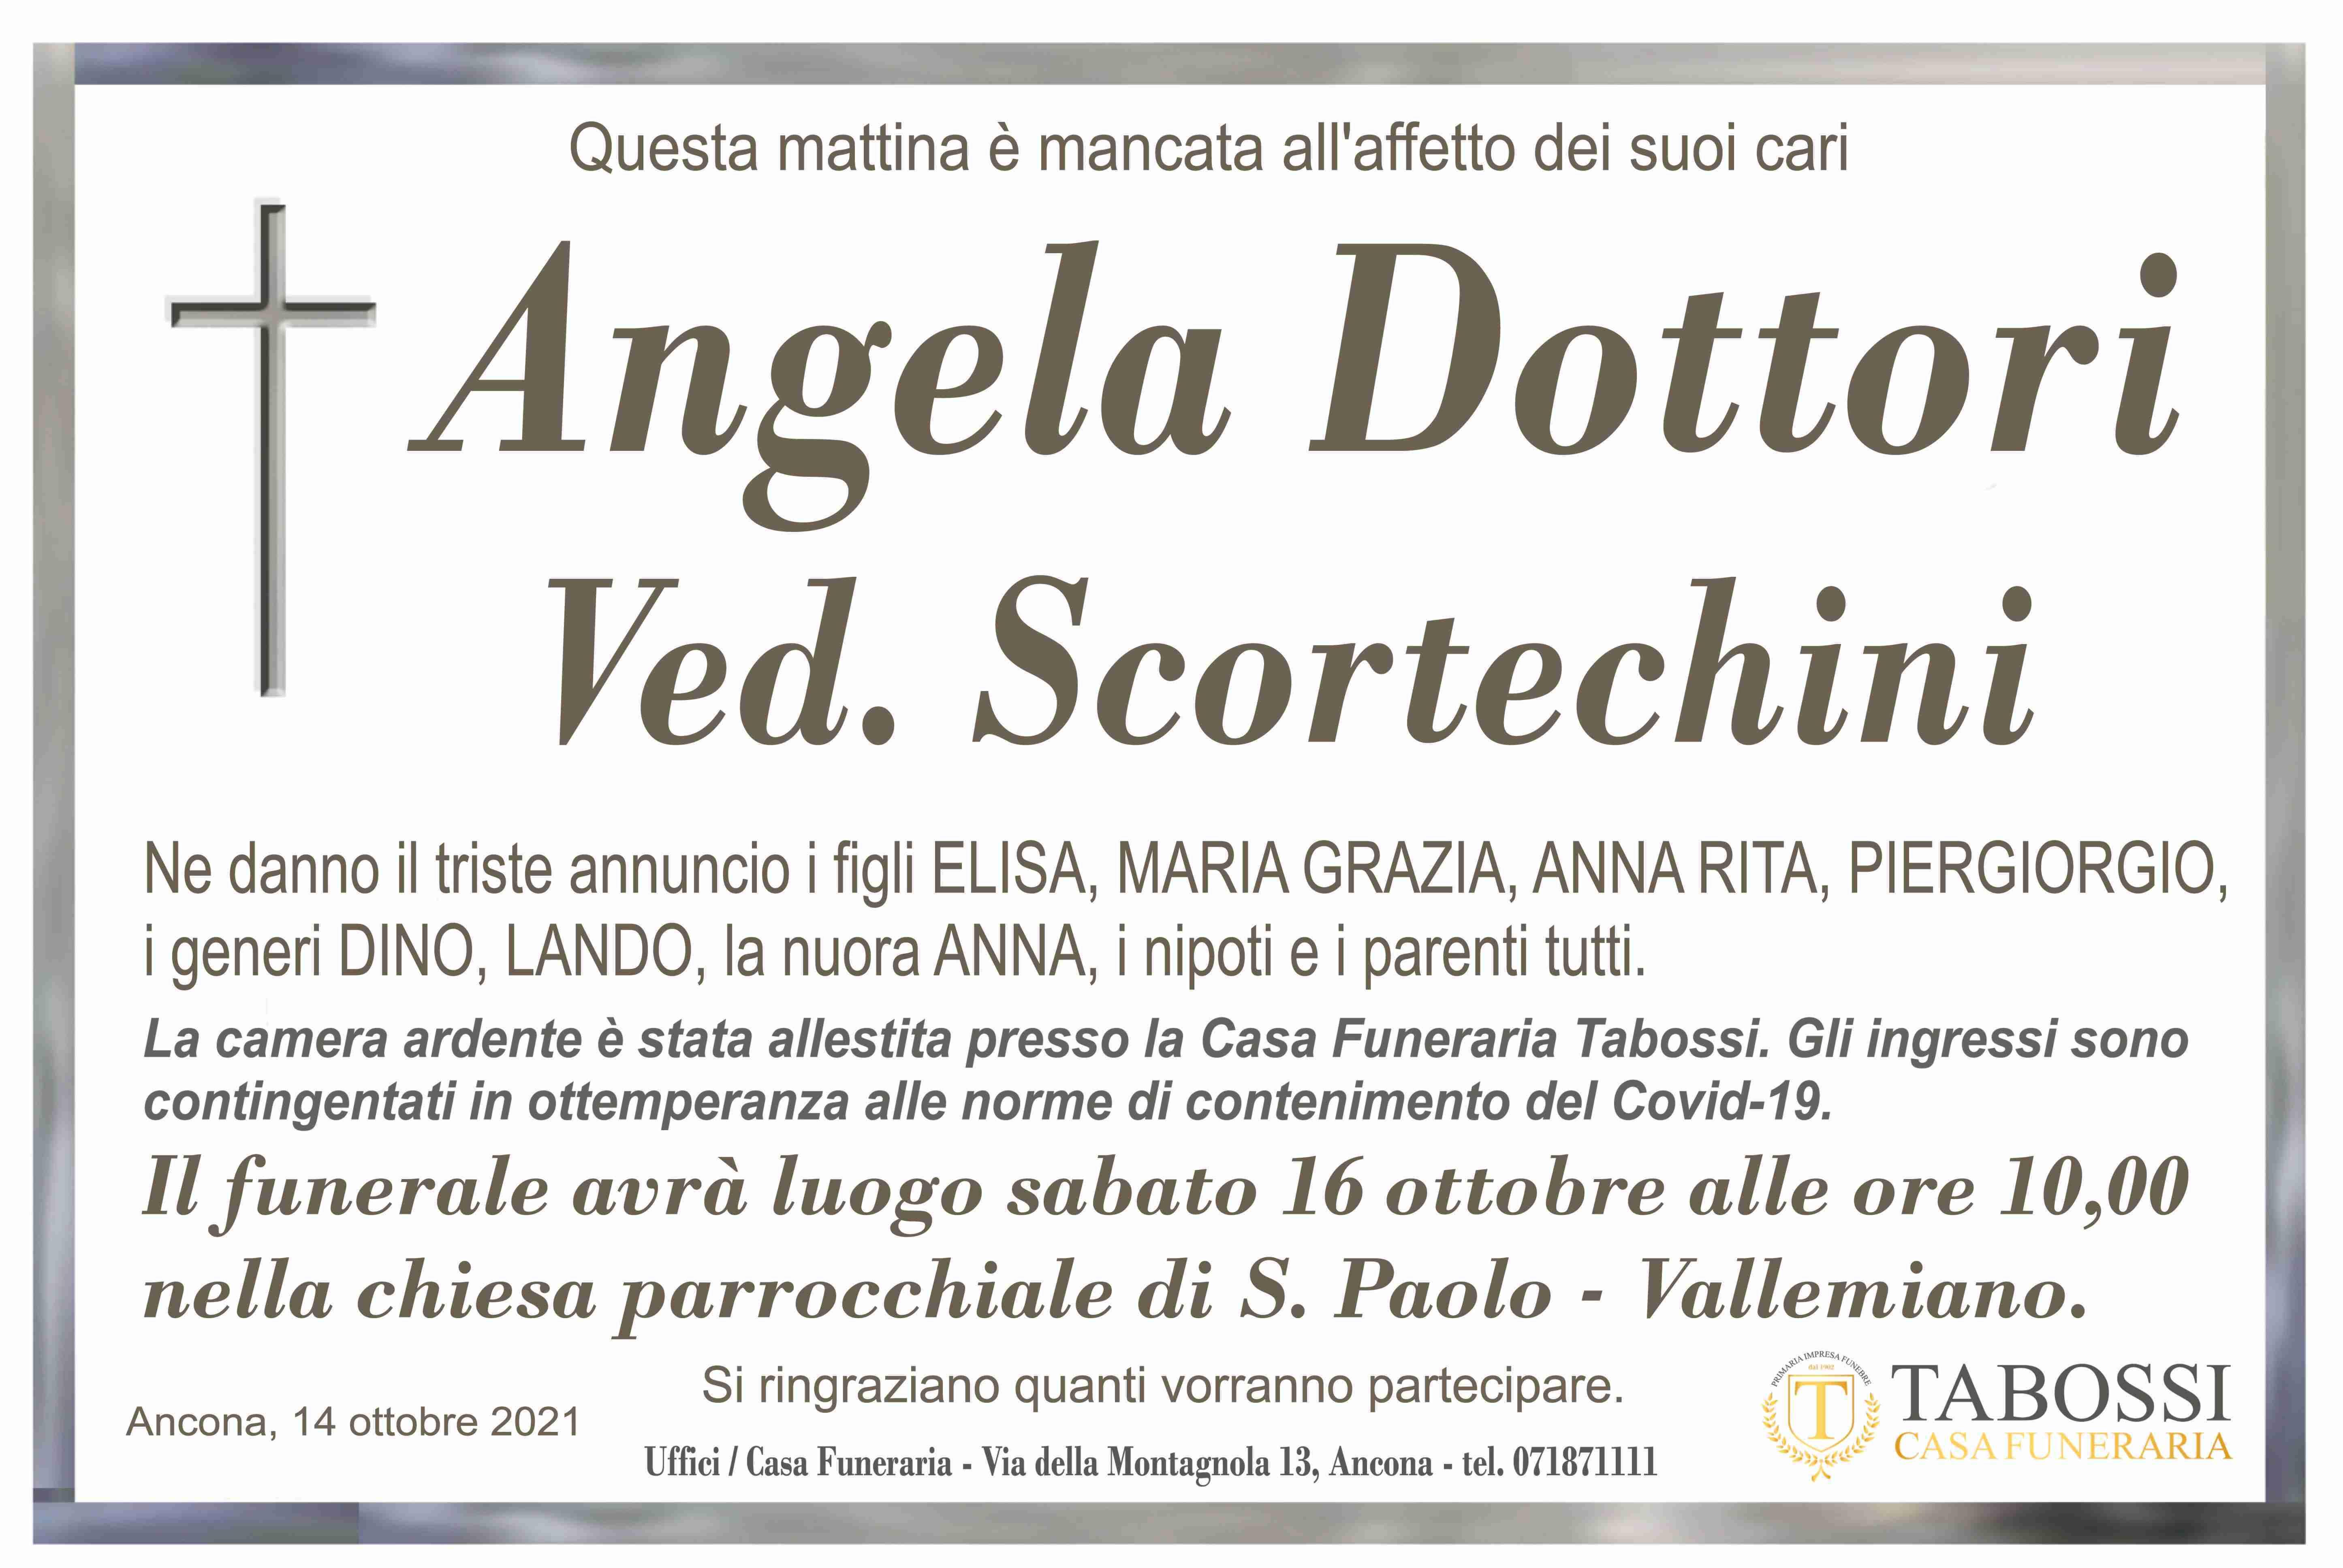 Angela Dottori